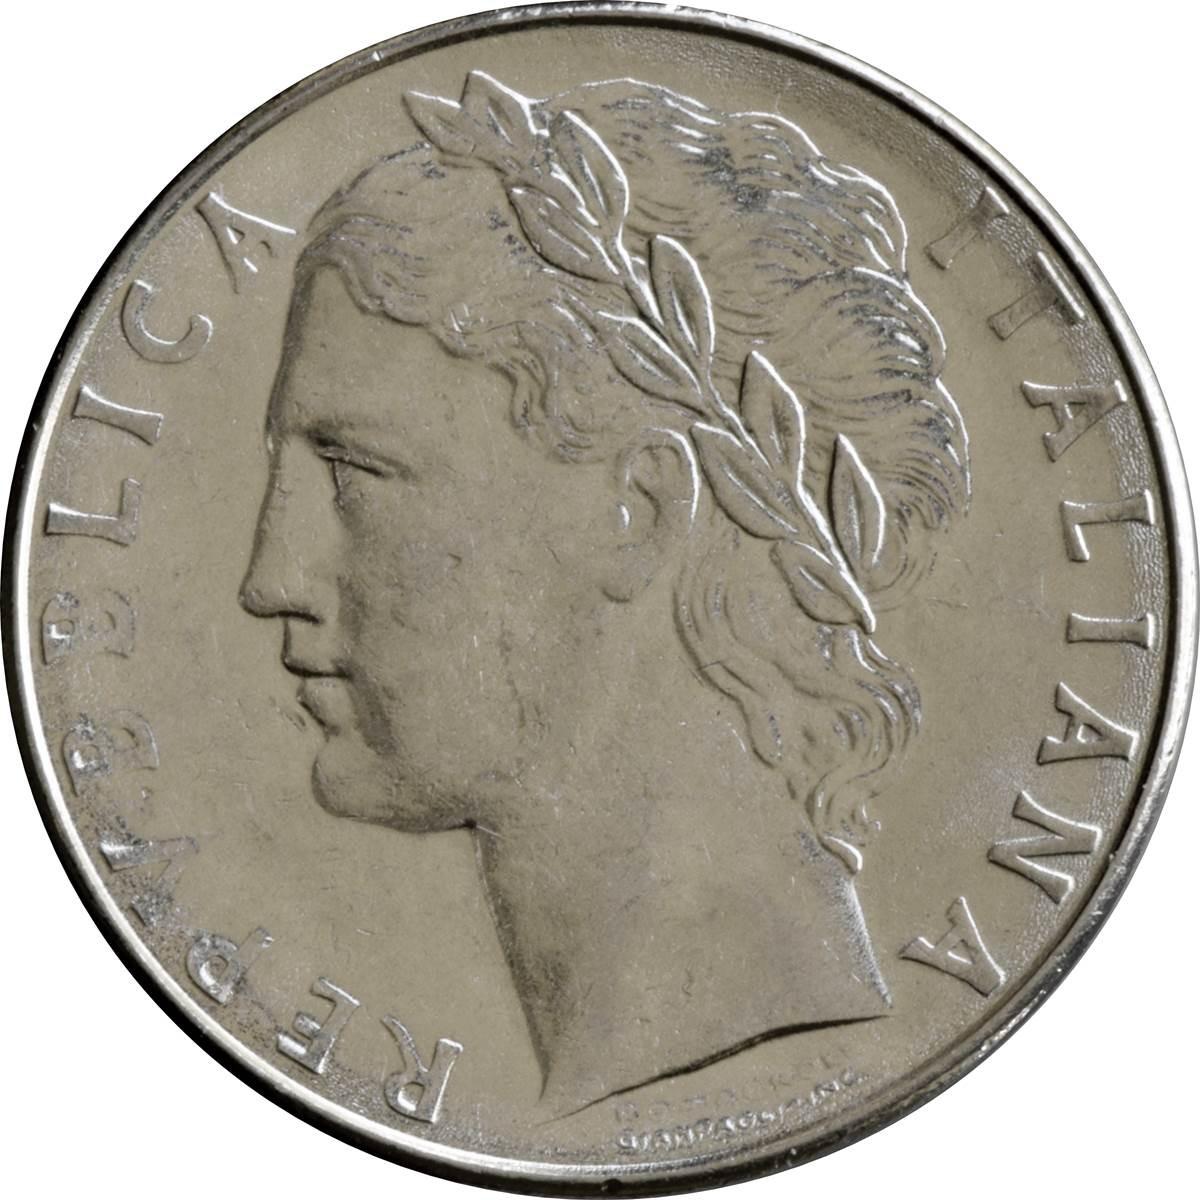 Italy 100 Lire (1955-1989 Large Type)